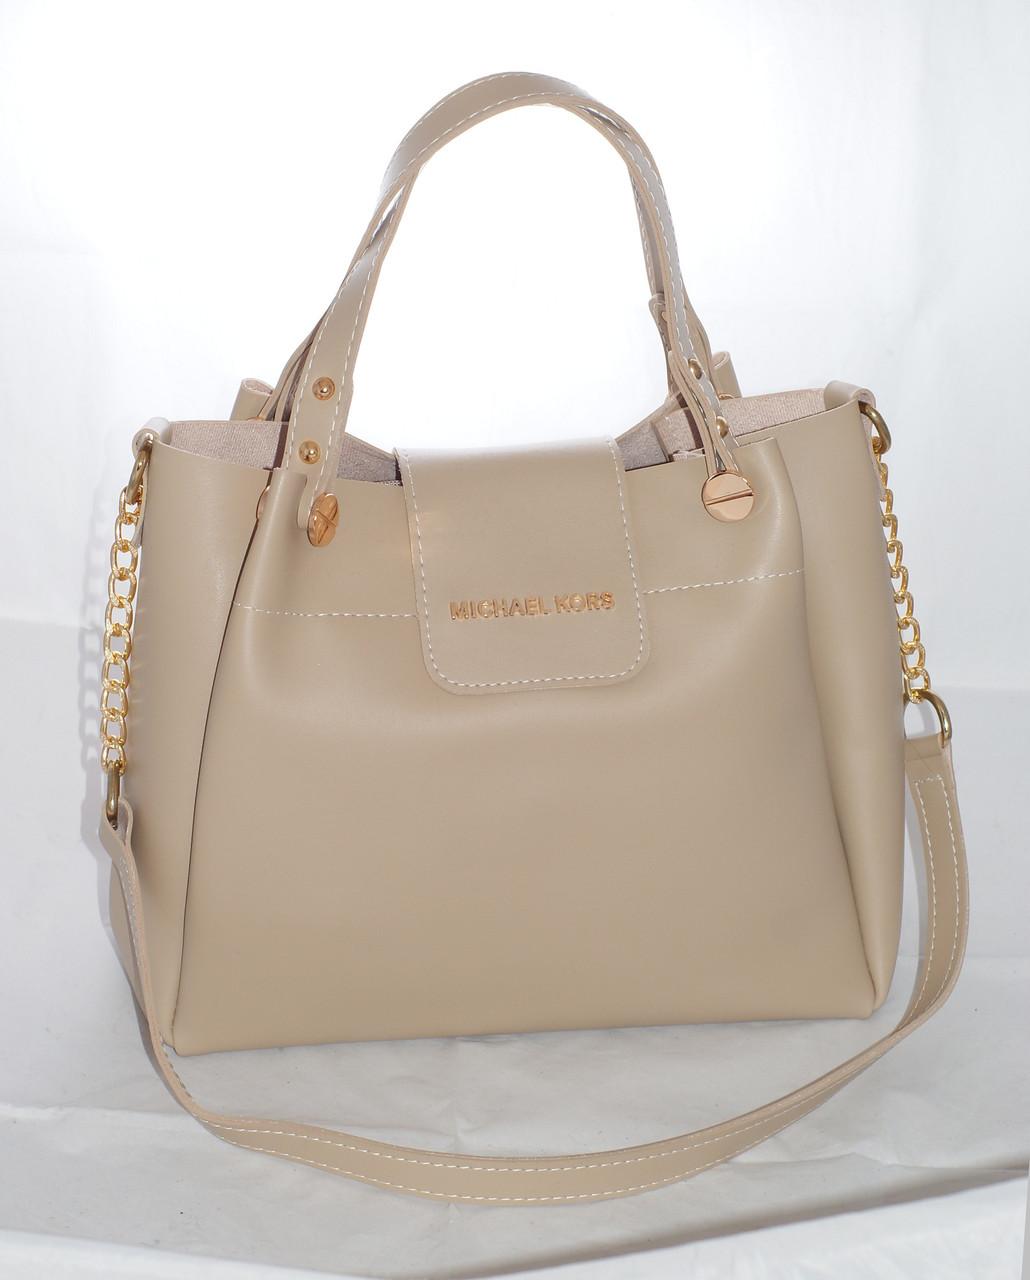 294ac21cad48 Женская сумка Michael Kors (Майкл Корс), бежевая  продажа, цена в ...